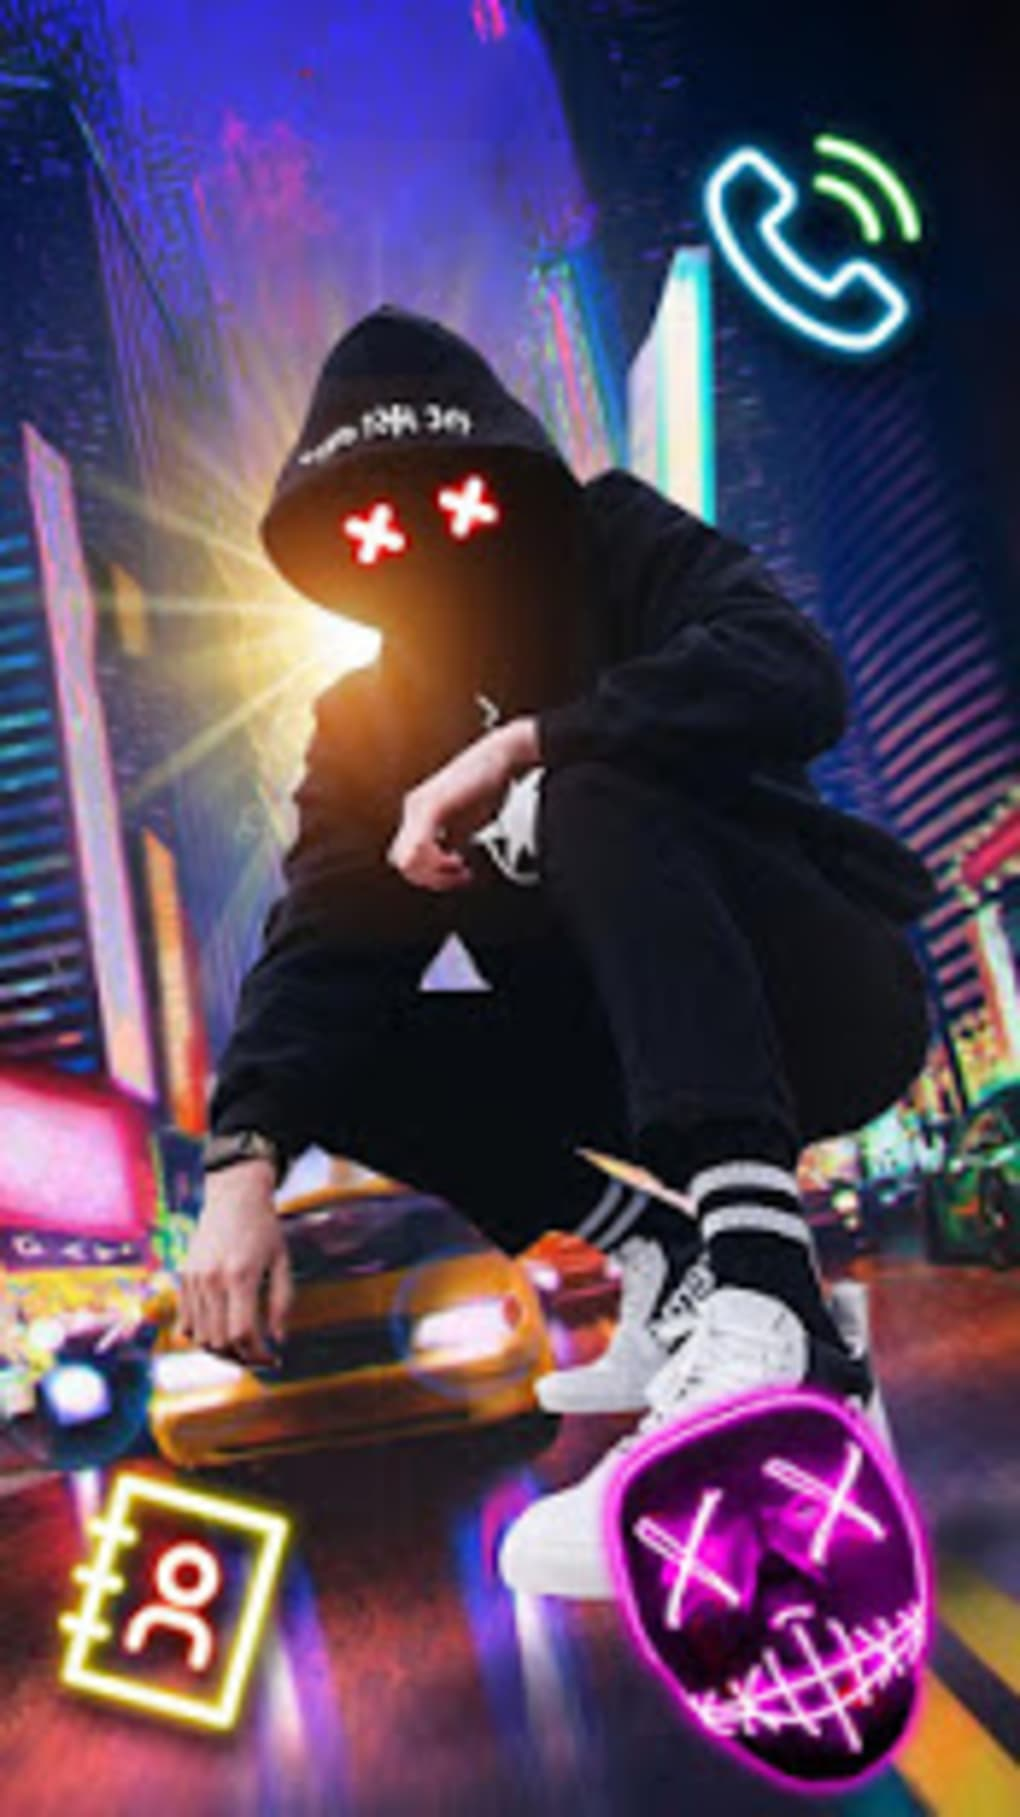 Neon Night Street Man Theme Live Wallpaper - Neon Night Street Man - HD Wallpaper